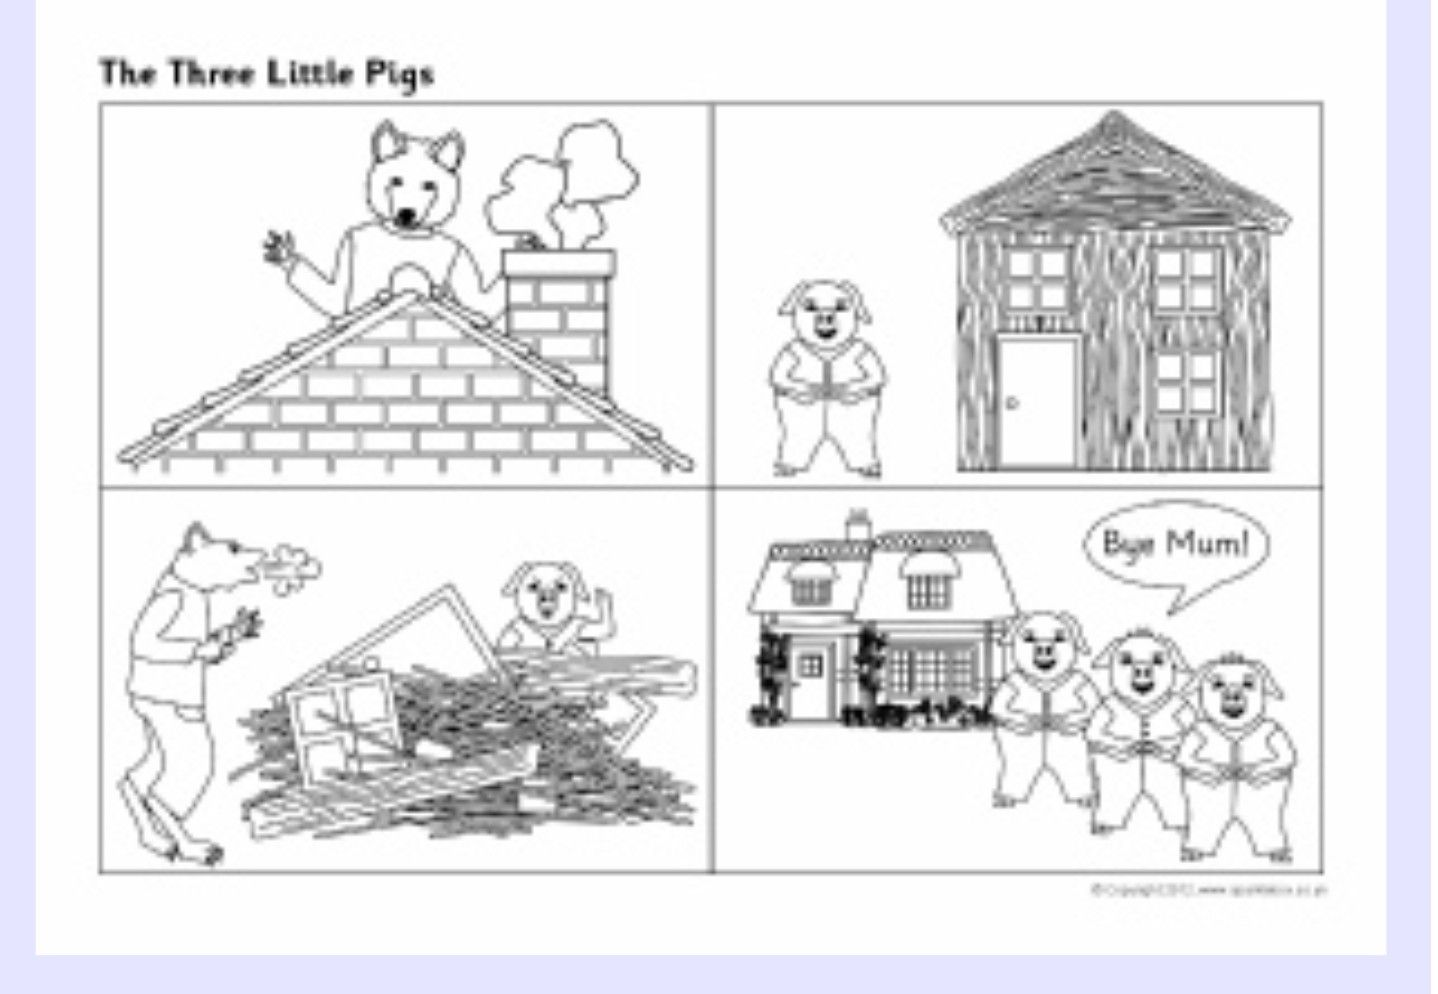 Pin By Vicky Matthews On Three Little Pigs